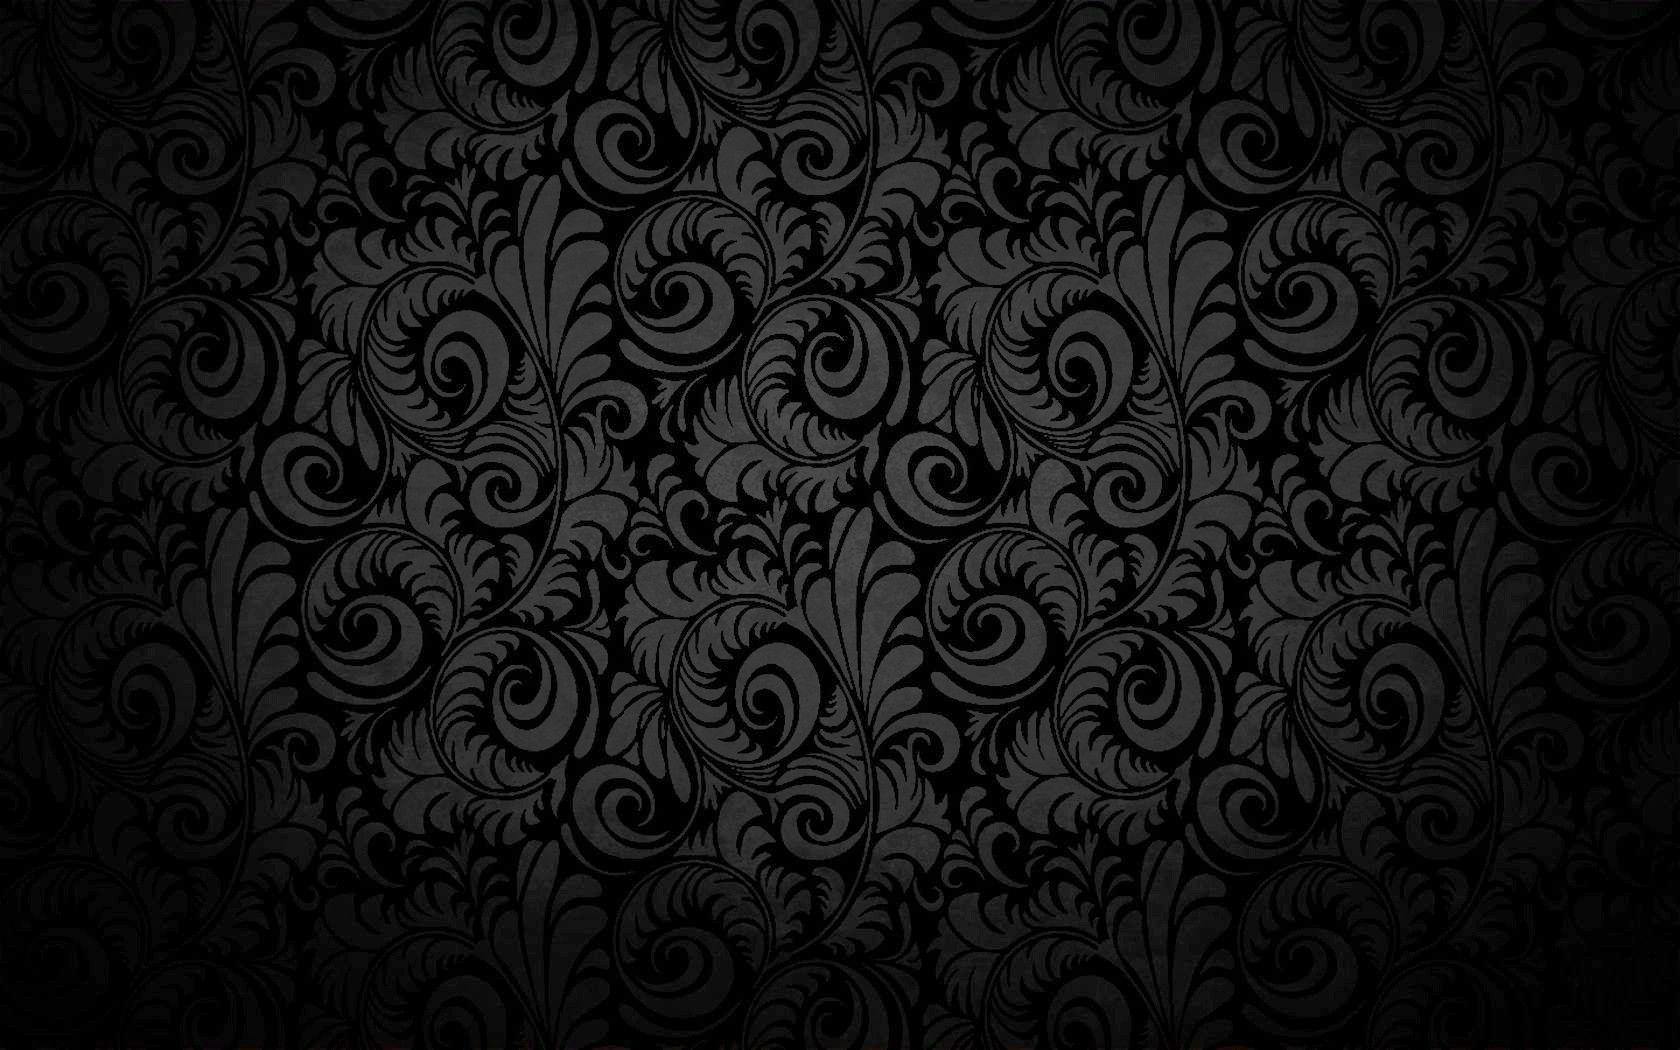 black pattern phone wallpaper - photo #26